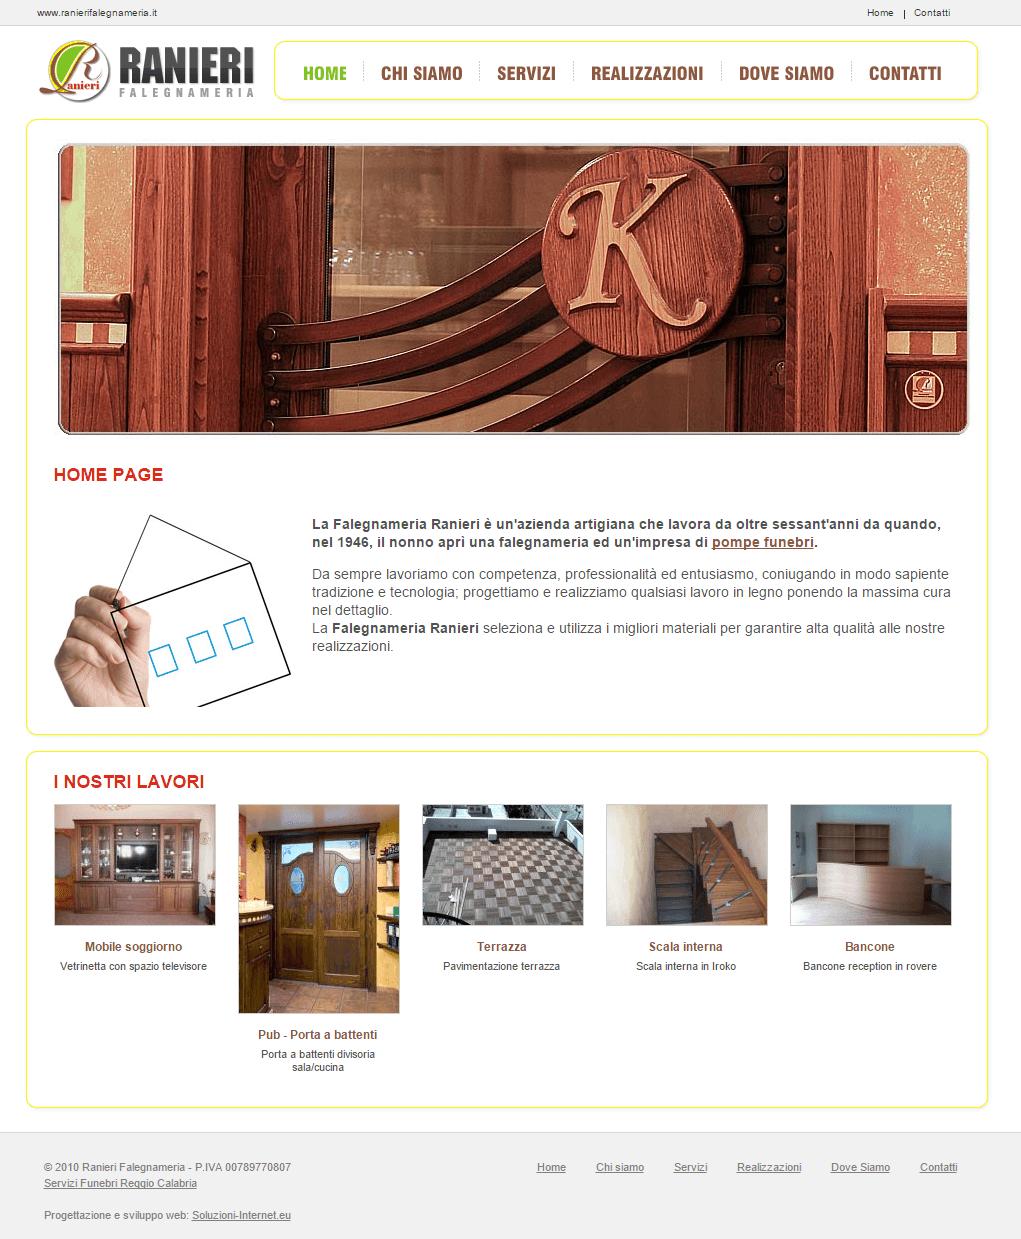 Falegnameria Ranieri Home Page